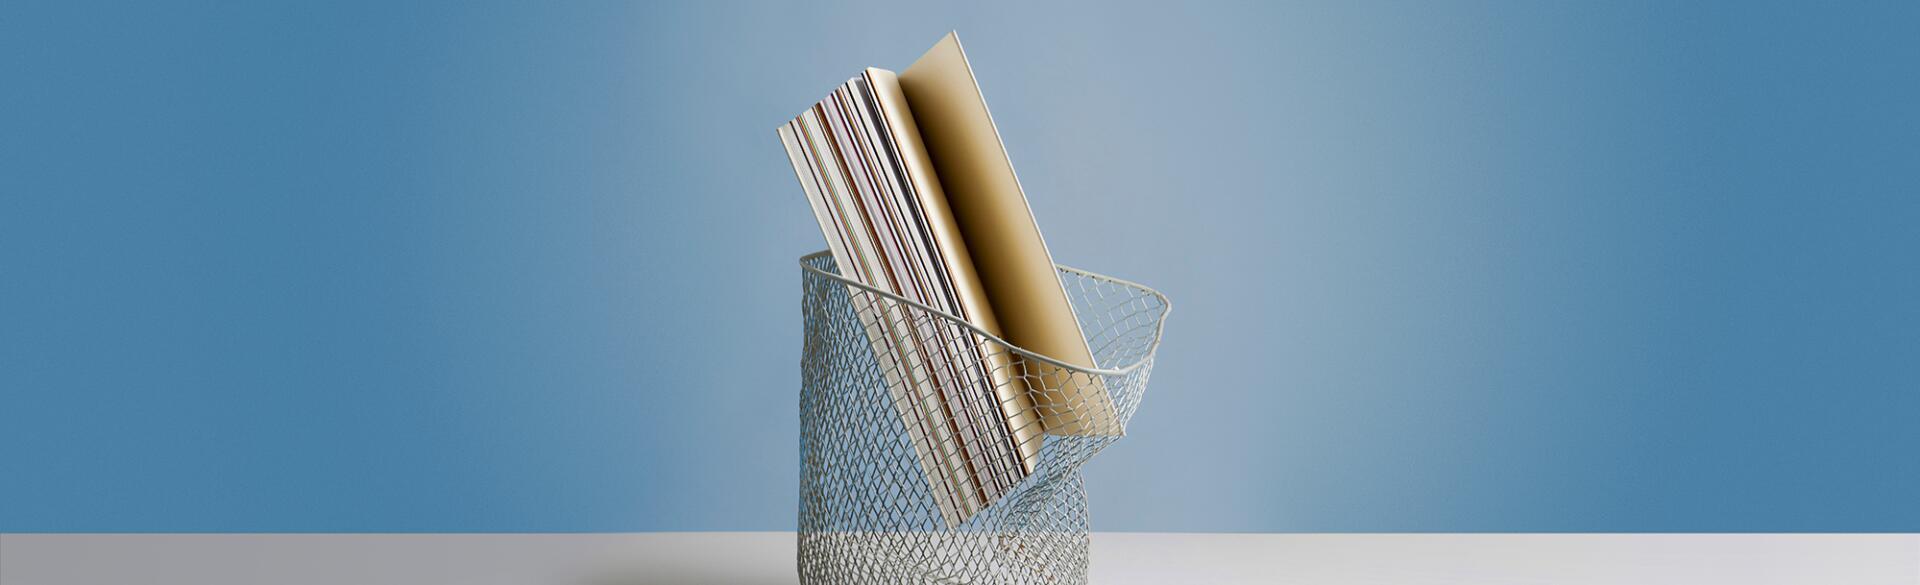 Large book in wastepaper basket